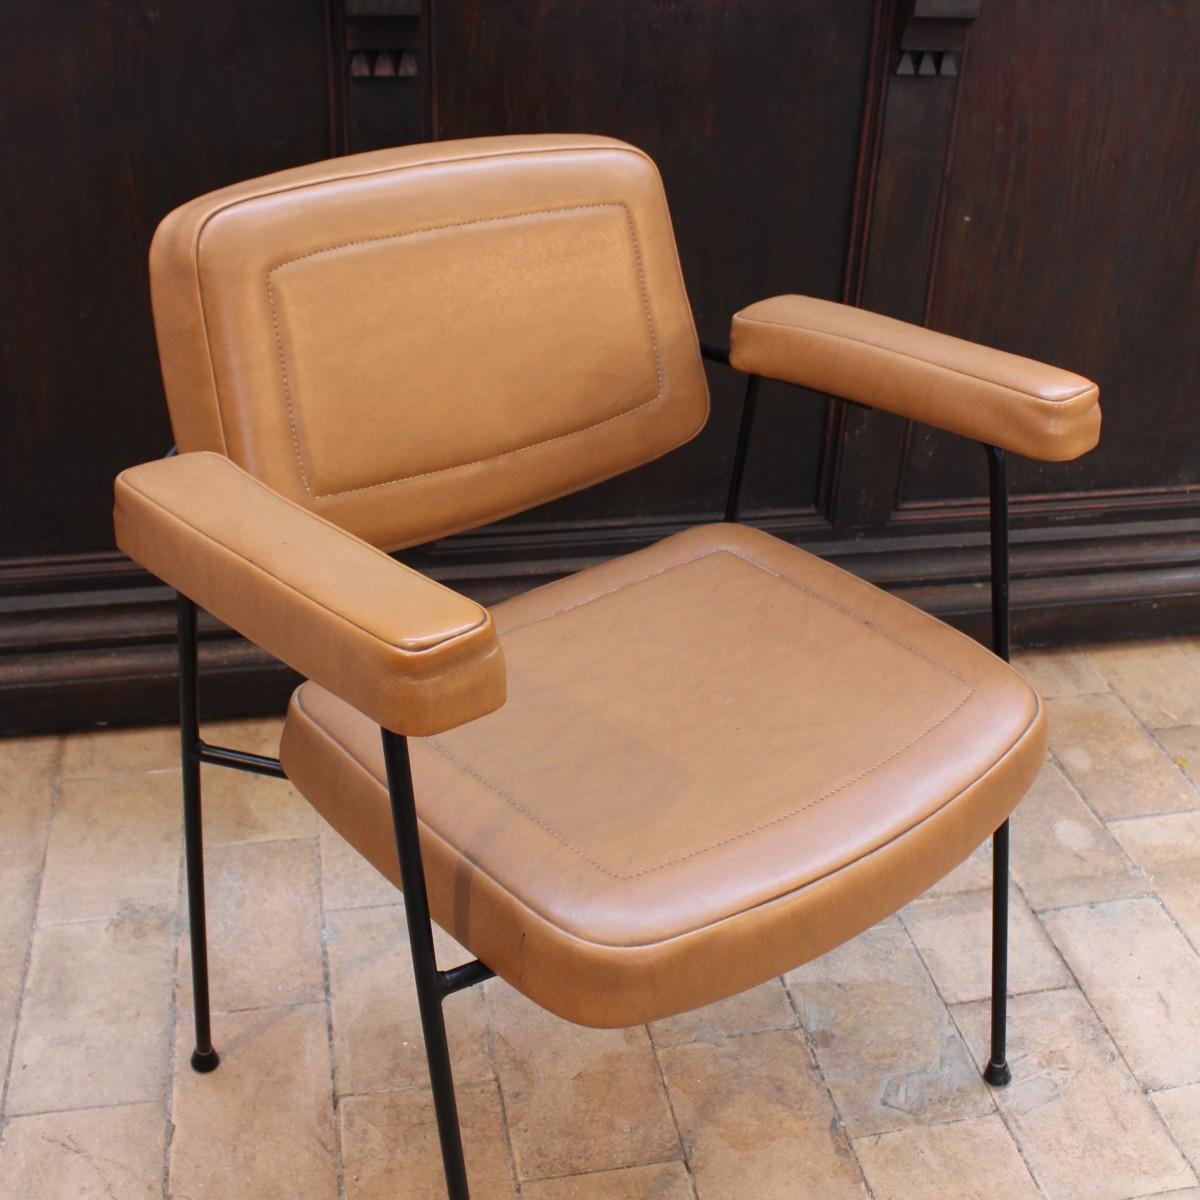 fauteuil pierre paulin 1950. Black Bedroom Furniture Sets. Home Design Ideas